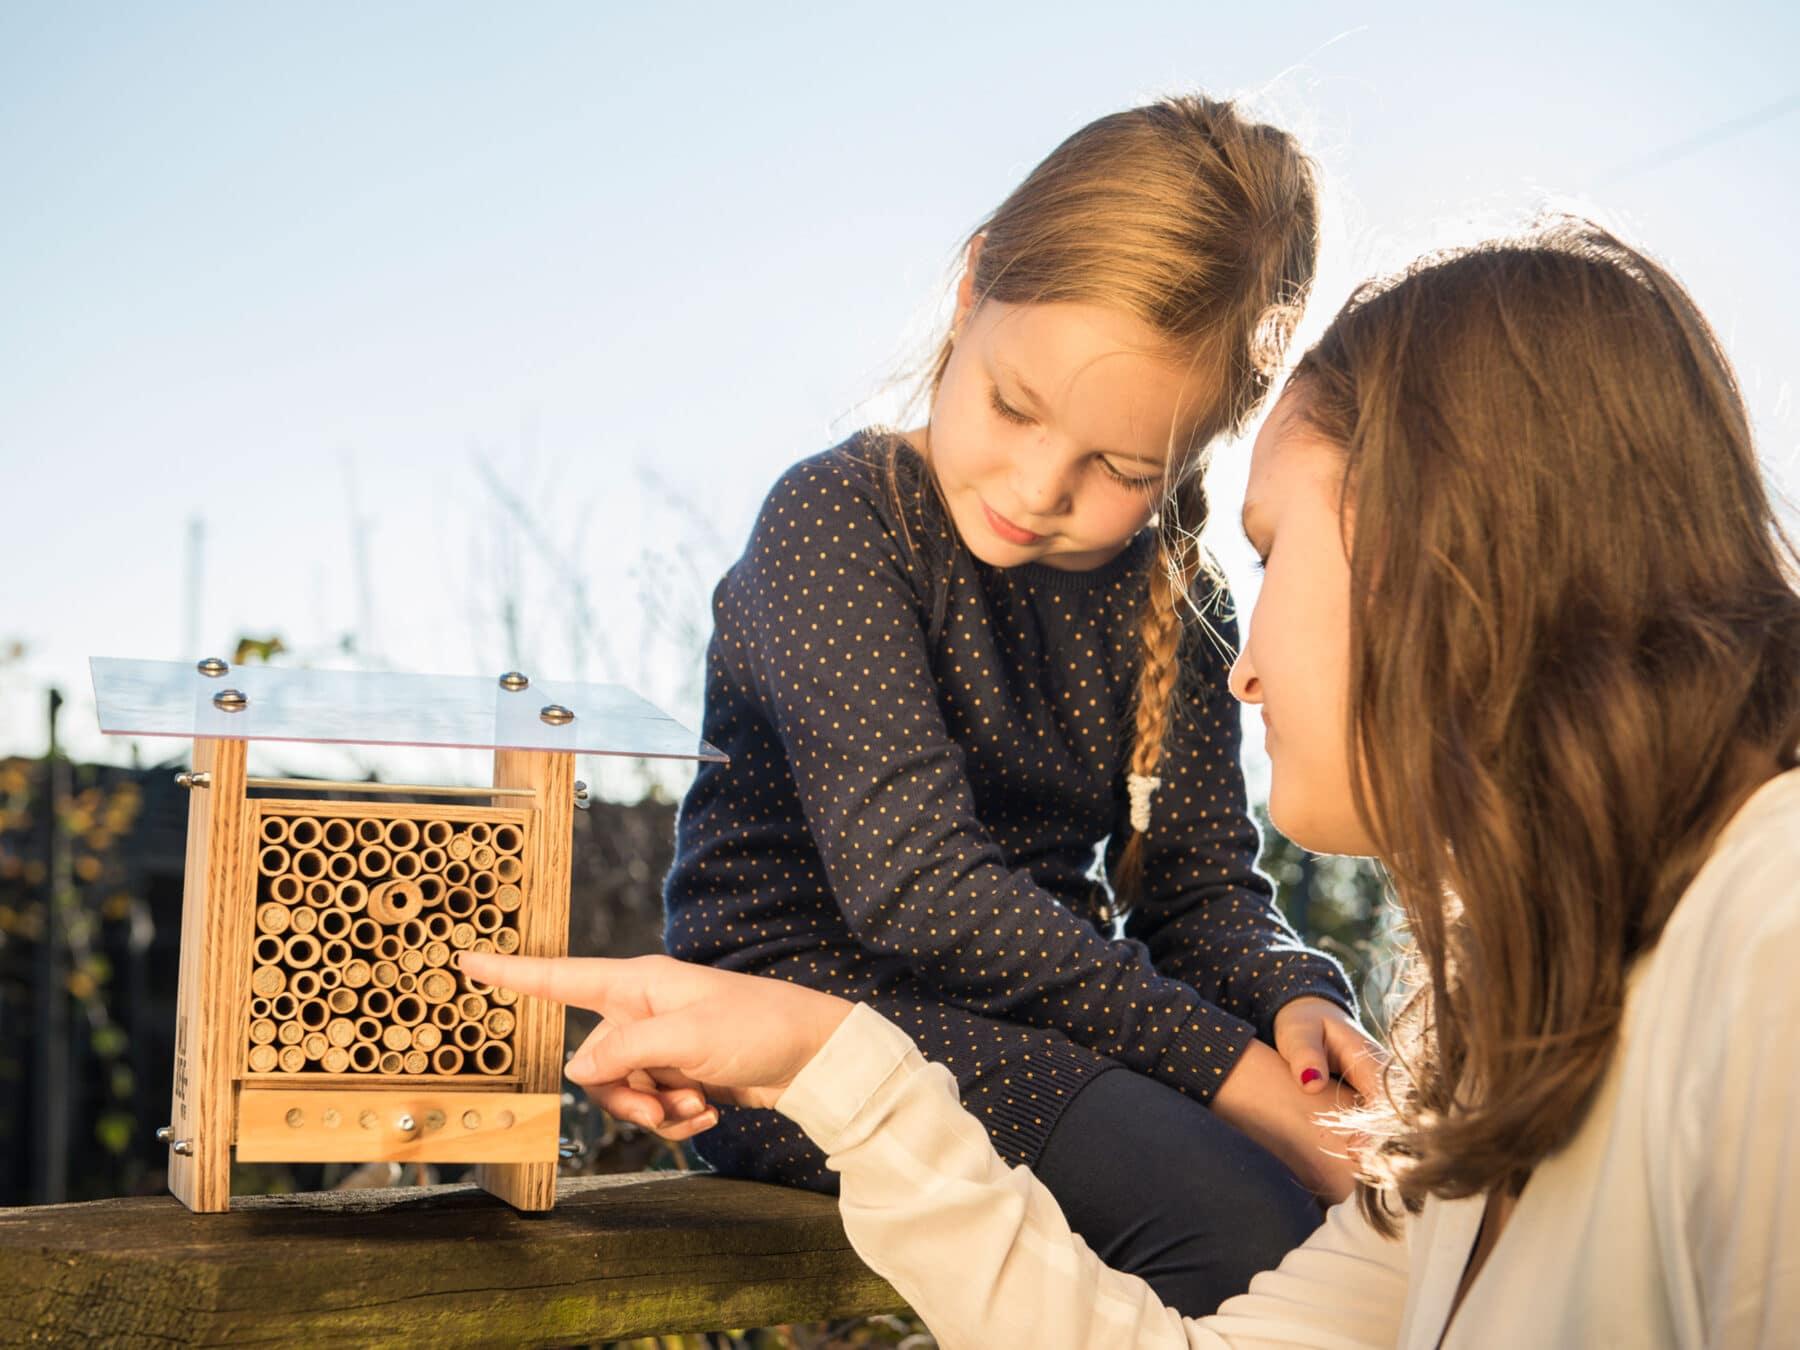 BeeHome Wildbienenhaus Wildbienen beobachten KURTS.ch